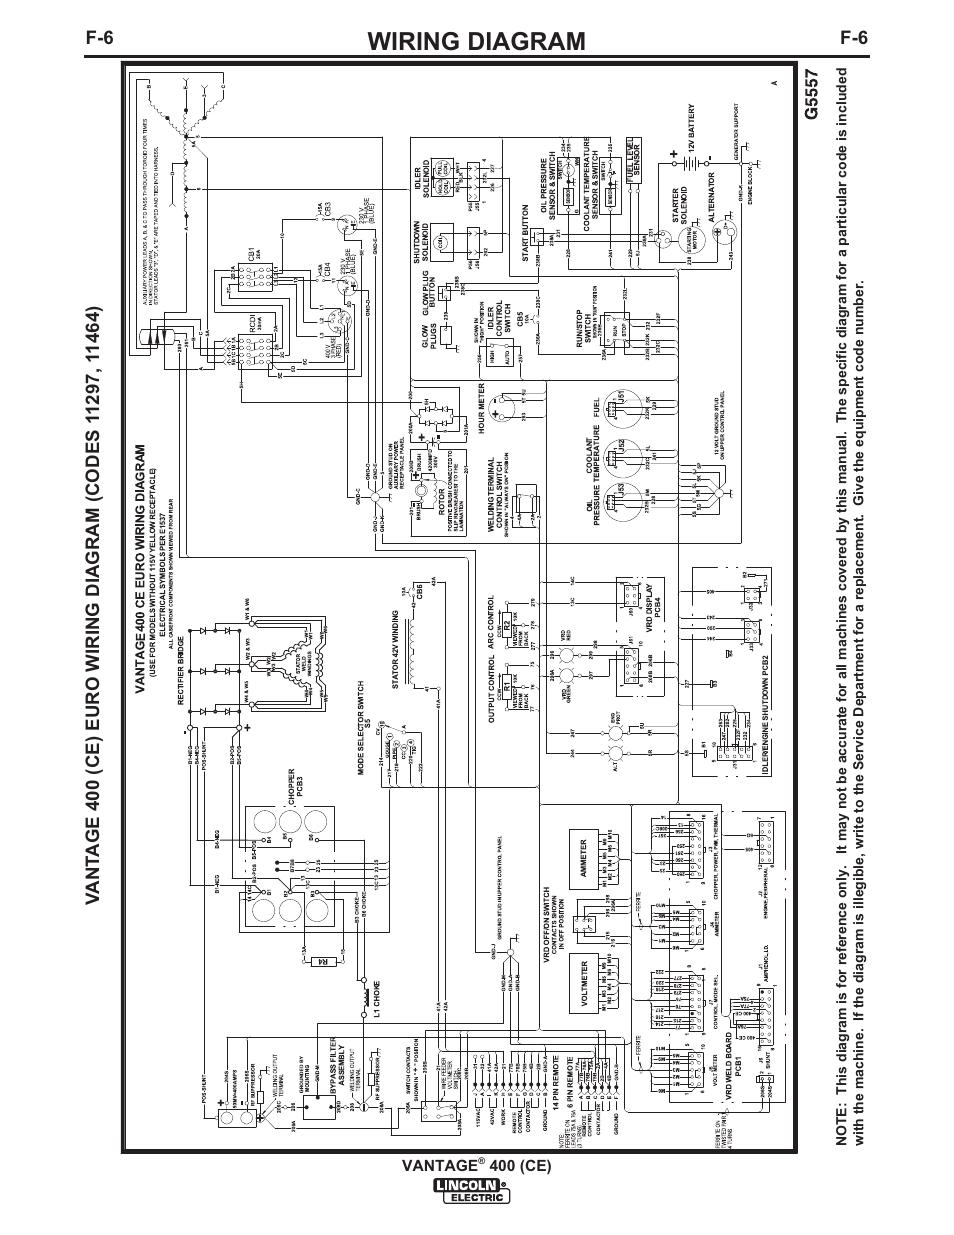 medium resolution of pioneer fh p8000bt wiring diagram color code pioneer fh pioneer avh p4000dvd wiring diagram pioneer avh p4000dvd wiring diagram